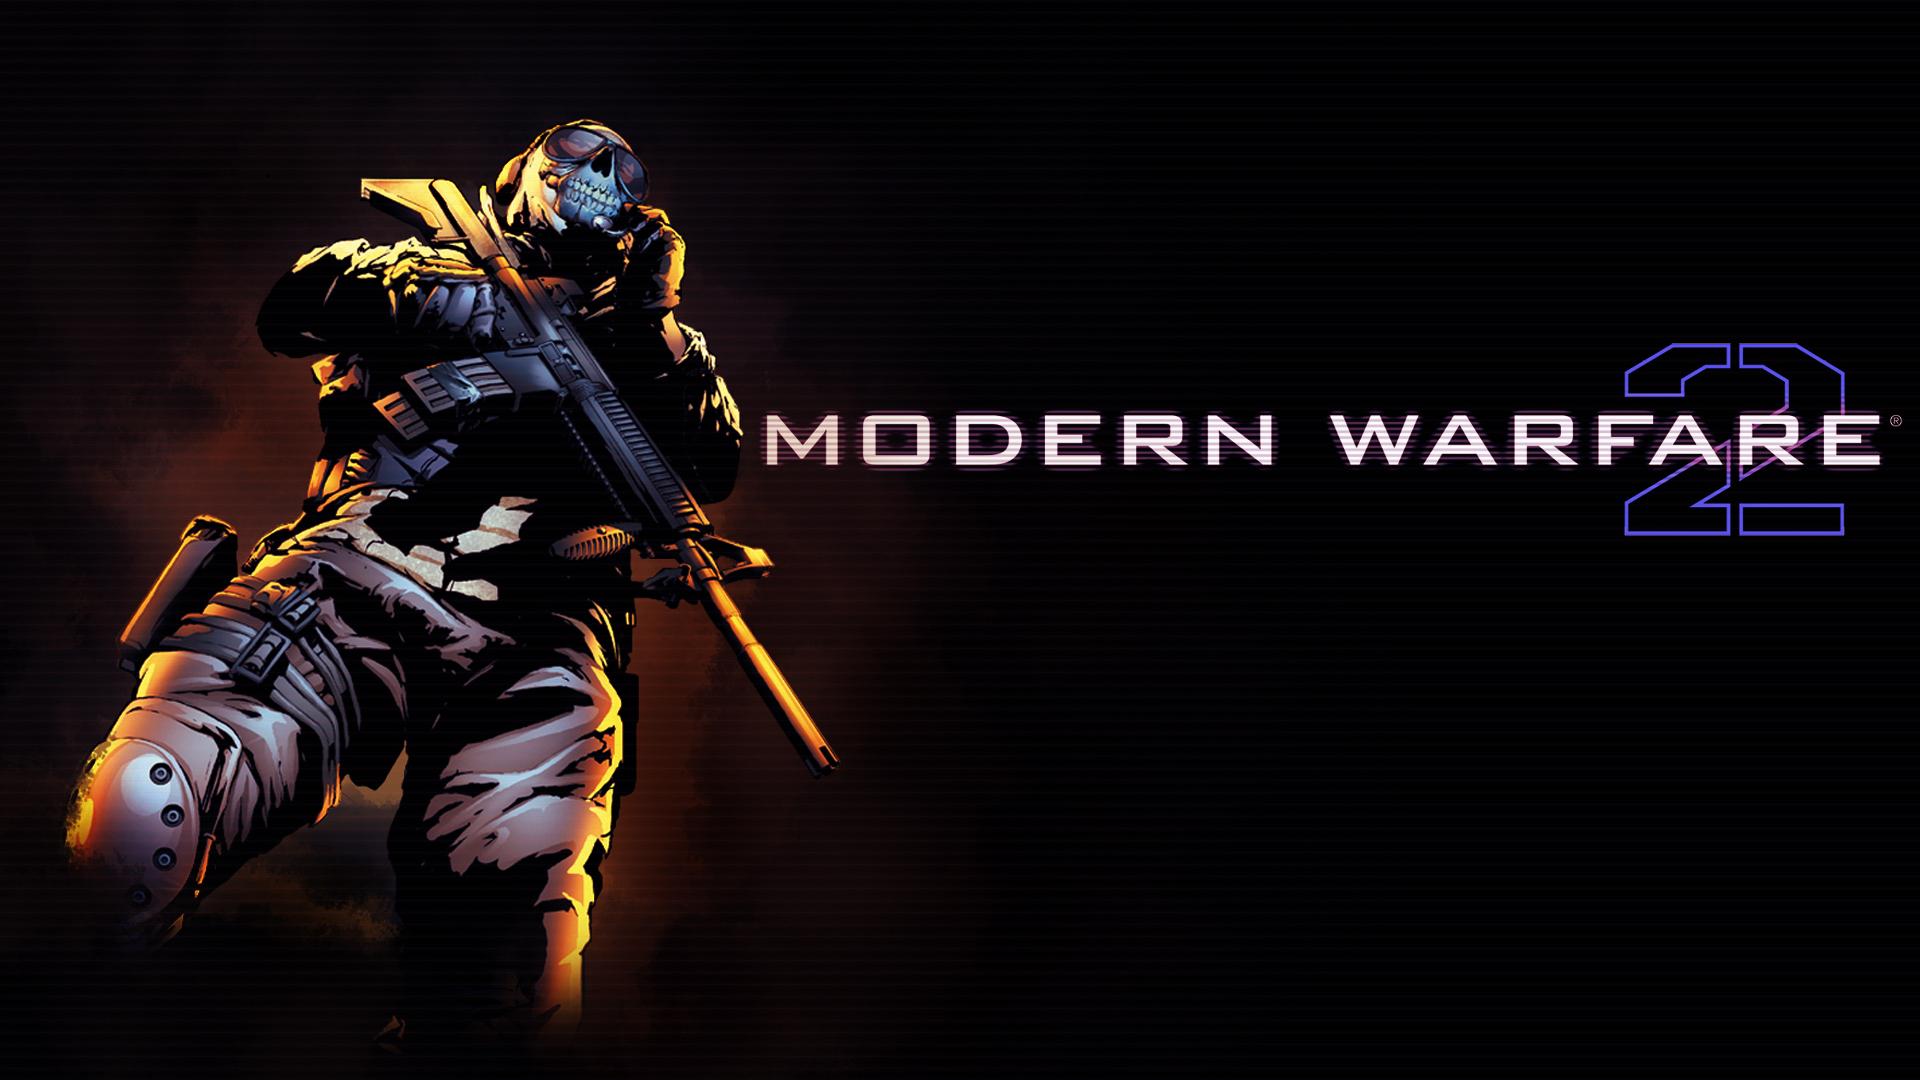 Call Of Duty Modern Warfare 2 Hd Wallpaper Background Image 1920x1080 Id 532216 Wallpaper Abyss